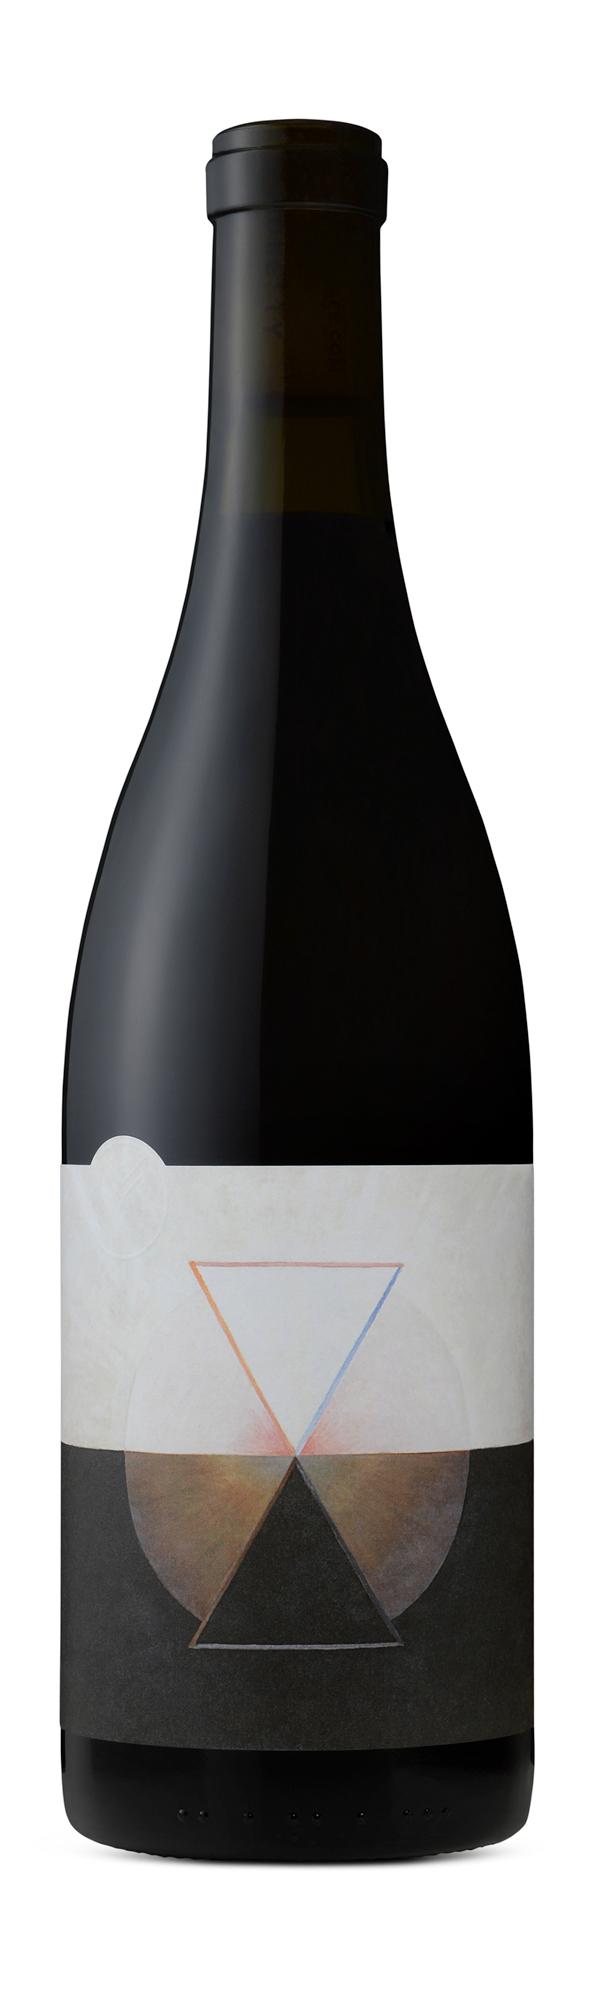 "KAIROS 2017 ""Polarity"" Pinot Noir $68"